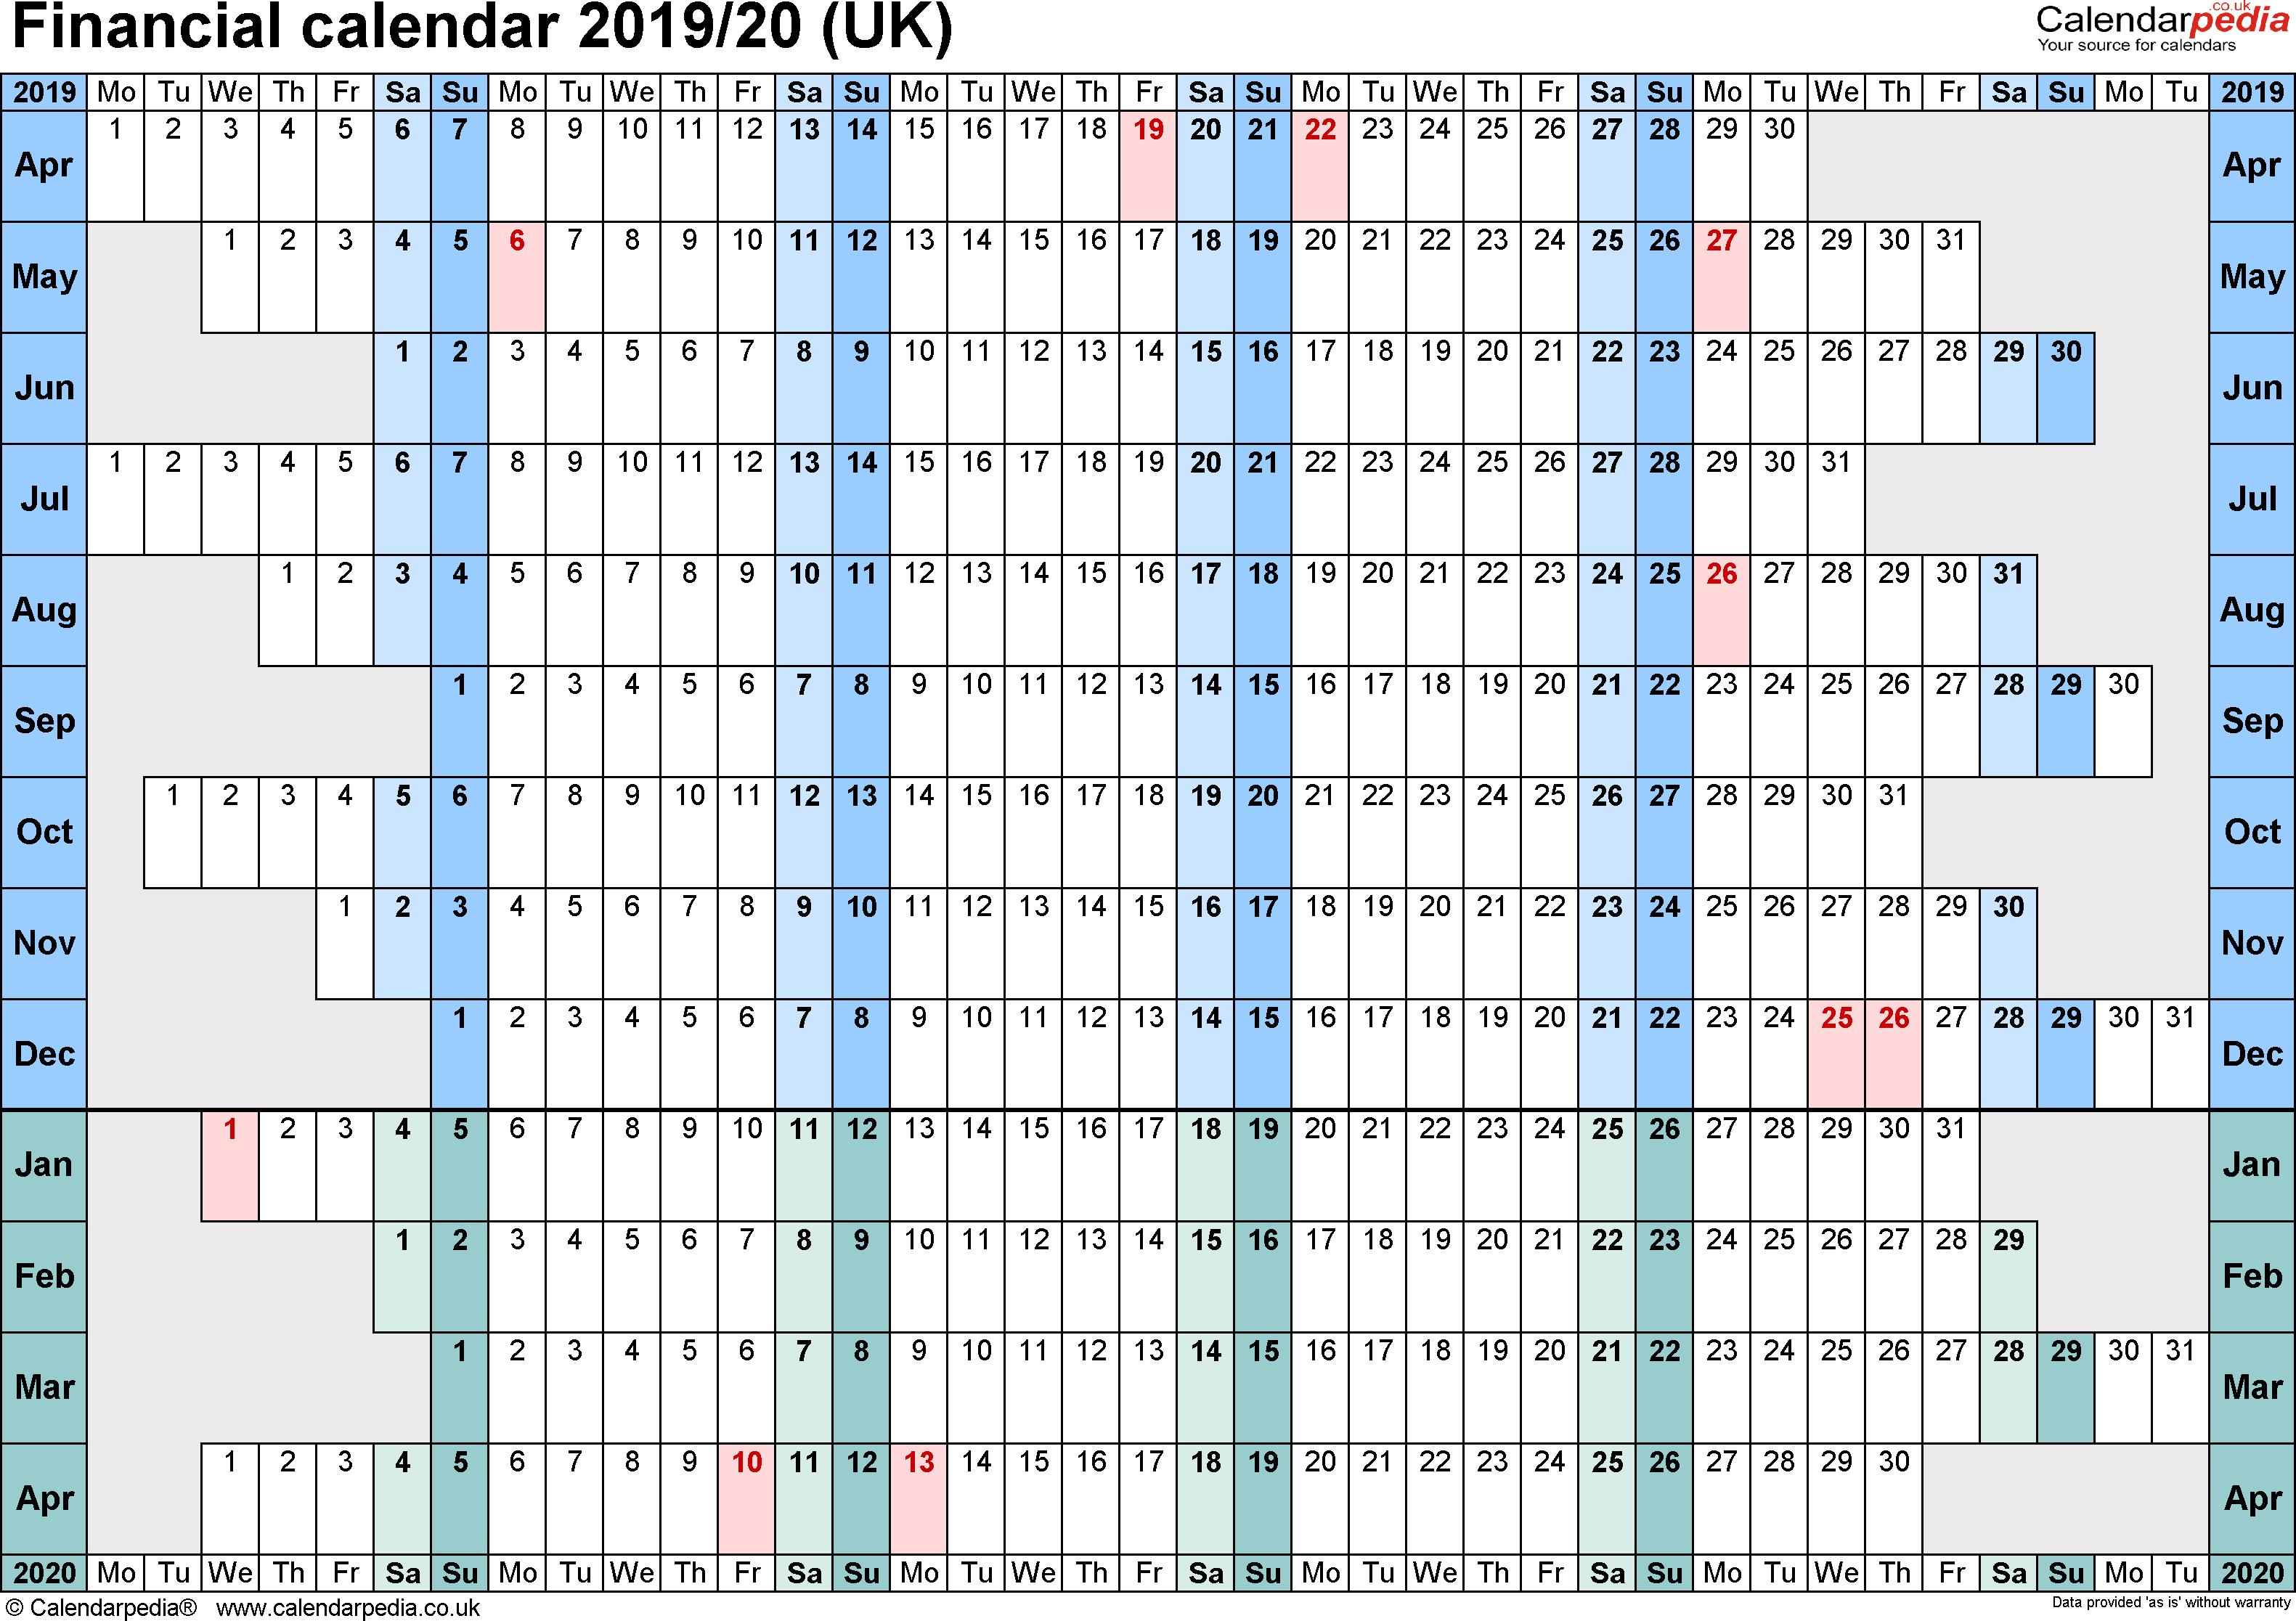 Financial Calendars 2019/20 (Uk) In Pdf Format inside 2019-2020 Calendar Financial Week Numbers